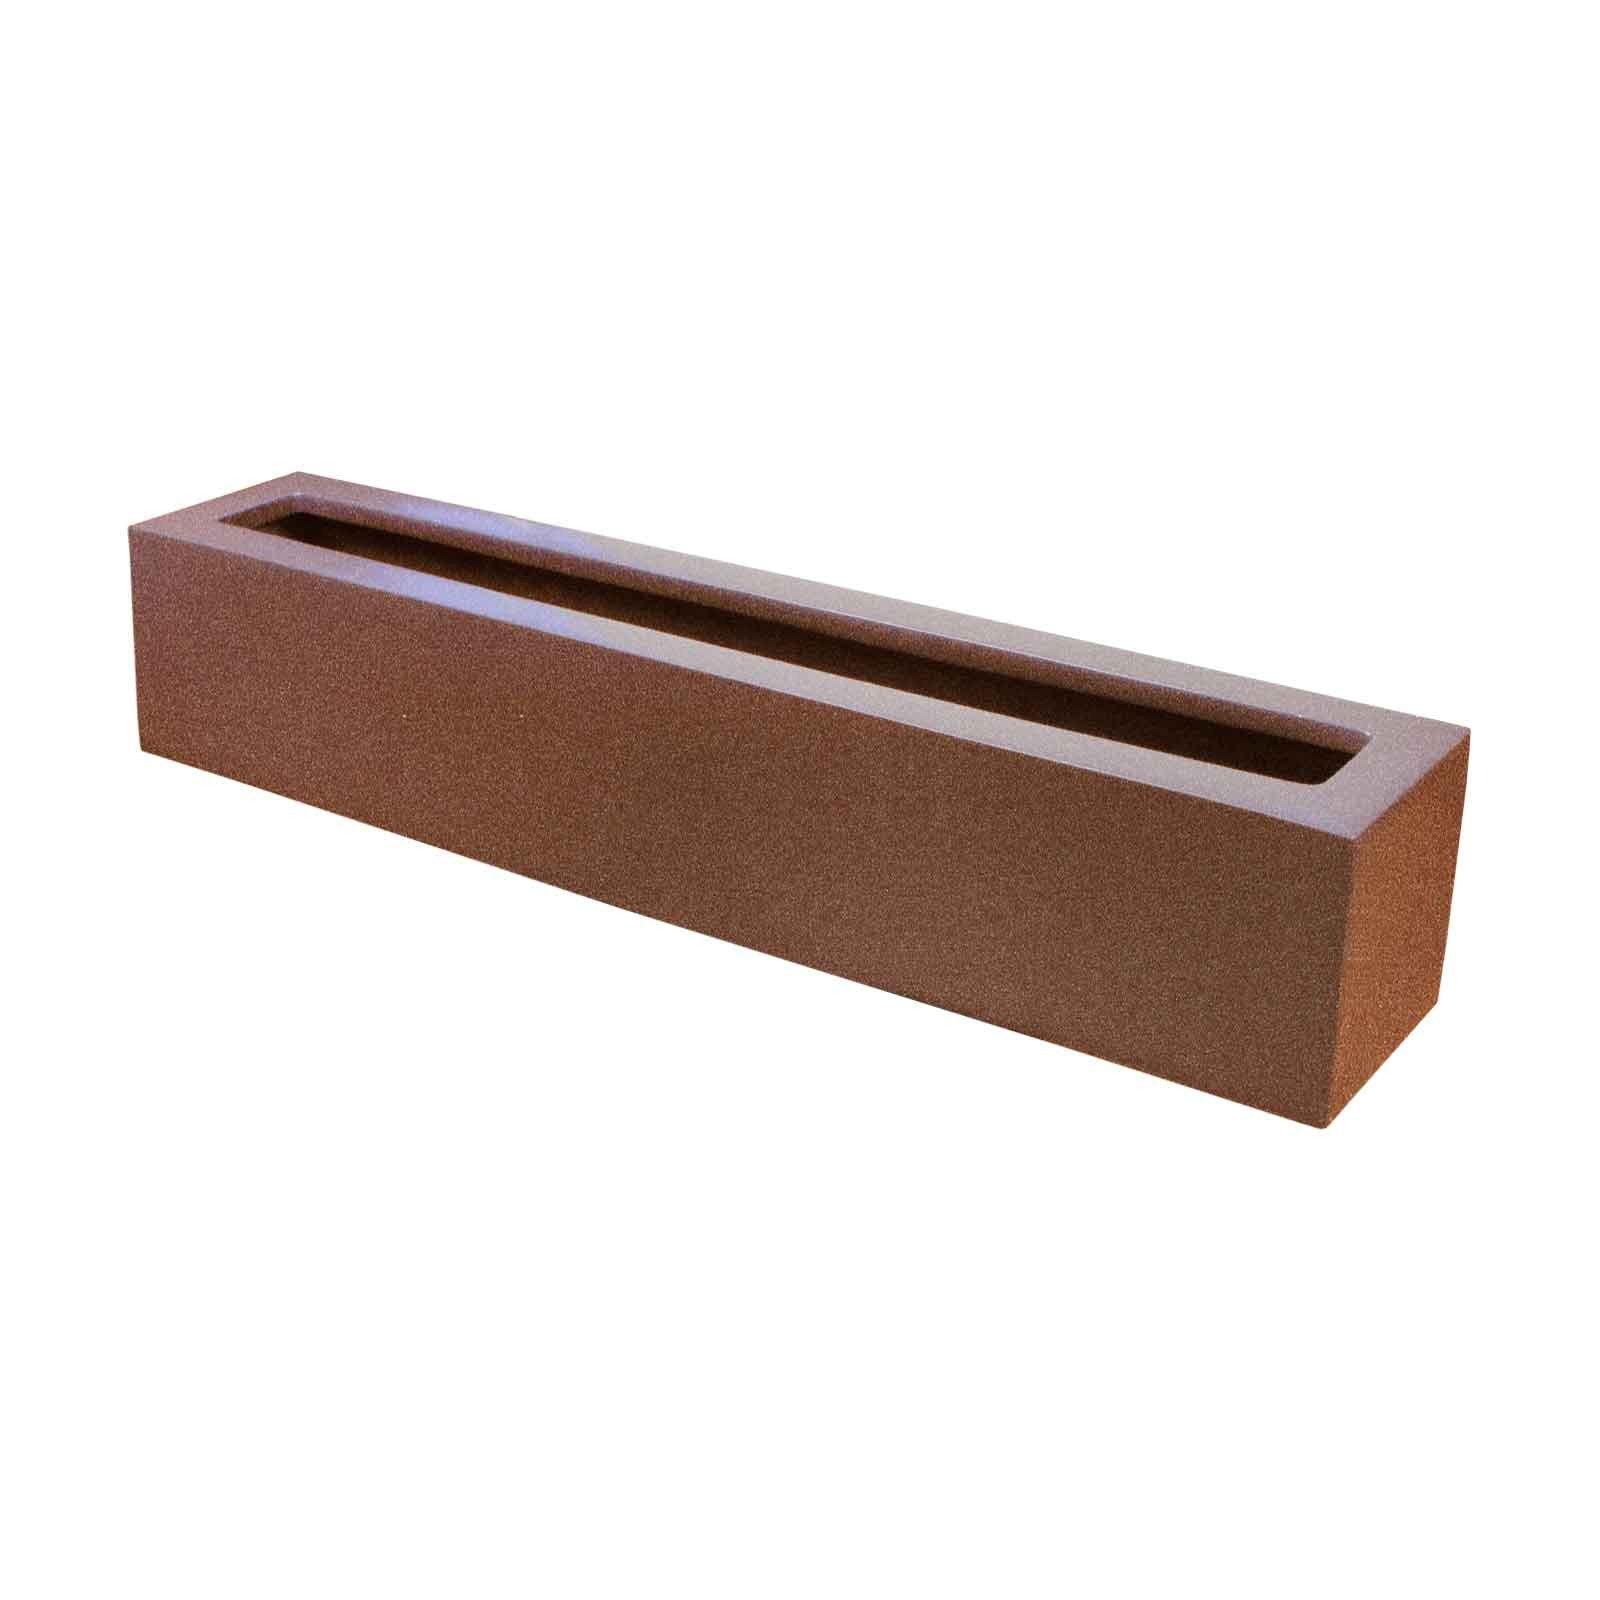 Narrow Outdoor Planter Box - Fiberglass - 42'L x 8'W x 8'H